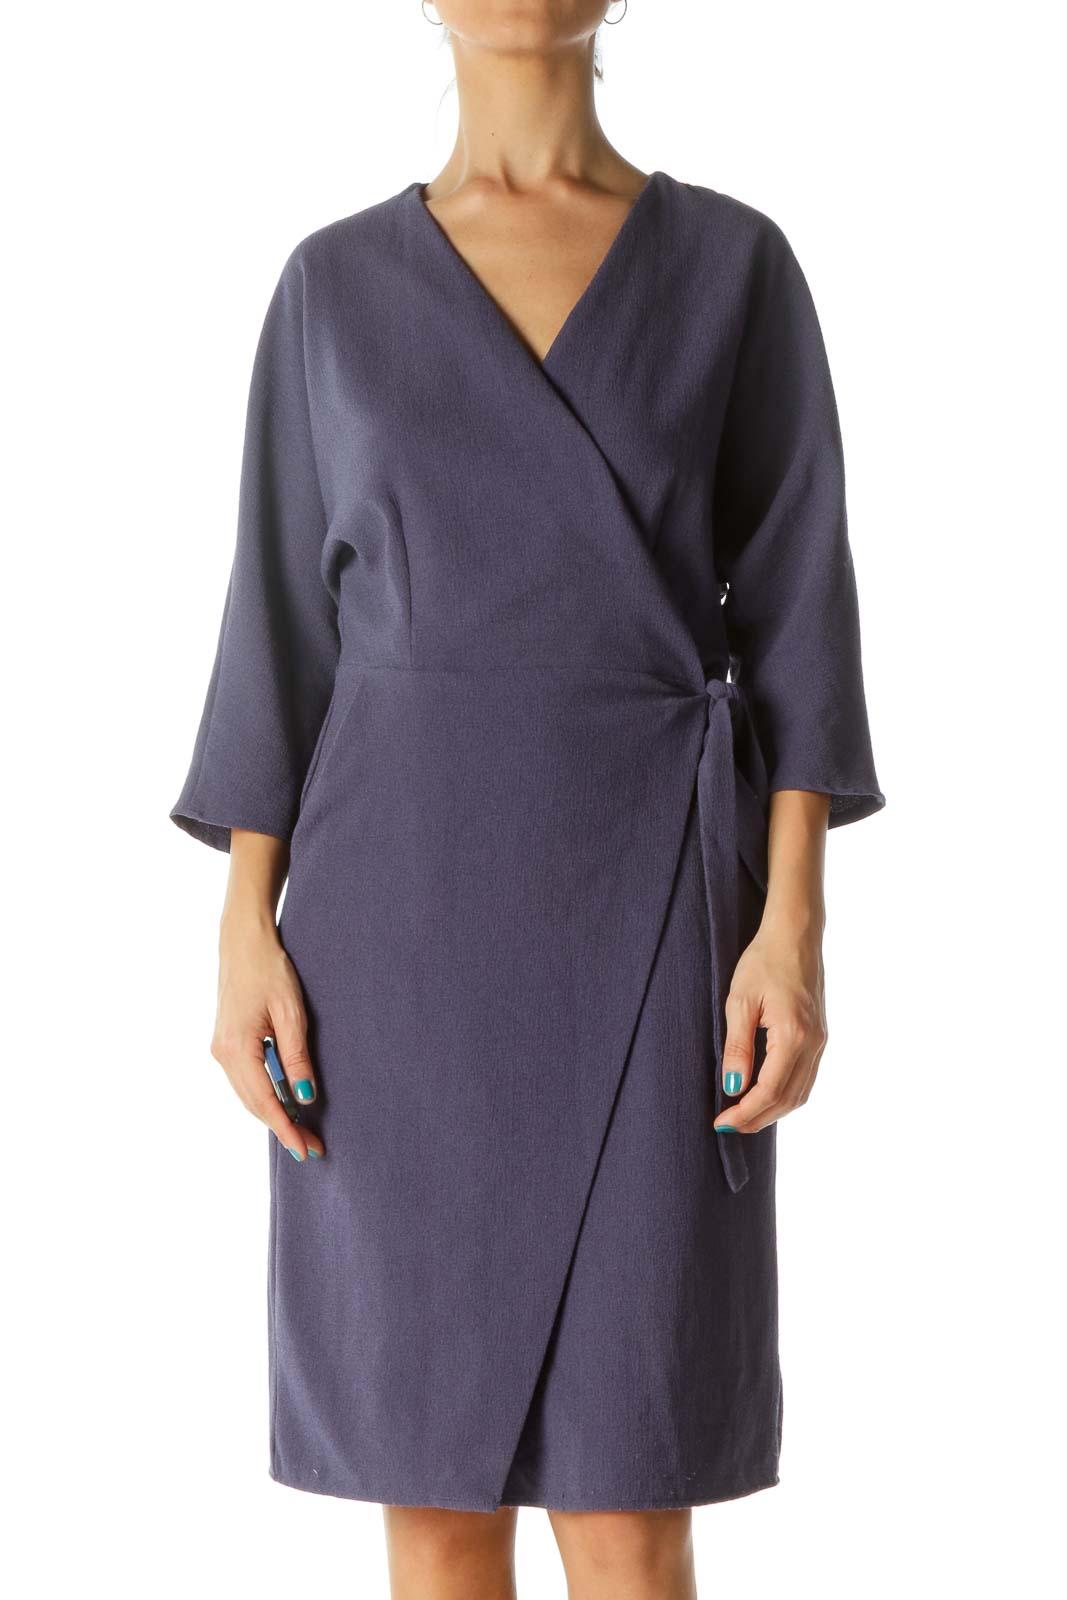 Blue Wrap Textured 3/4 Sleeve Dress